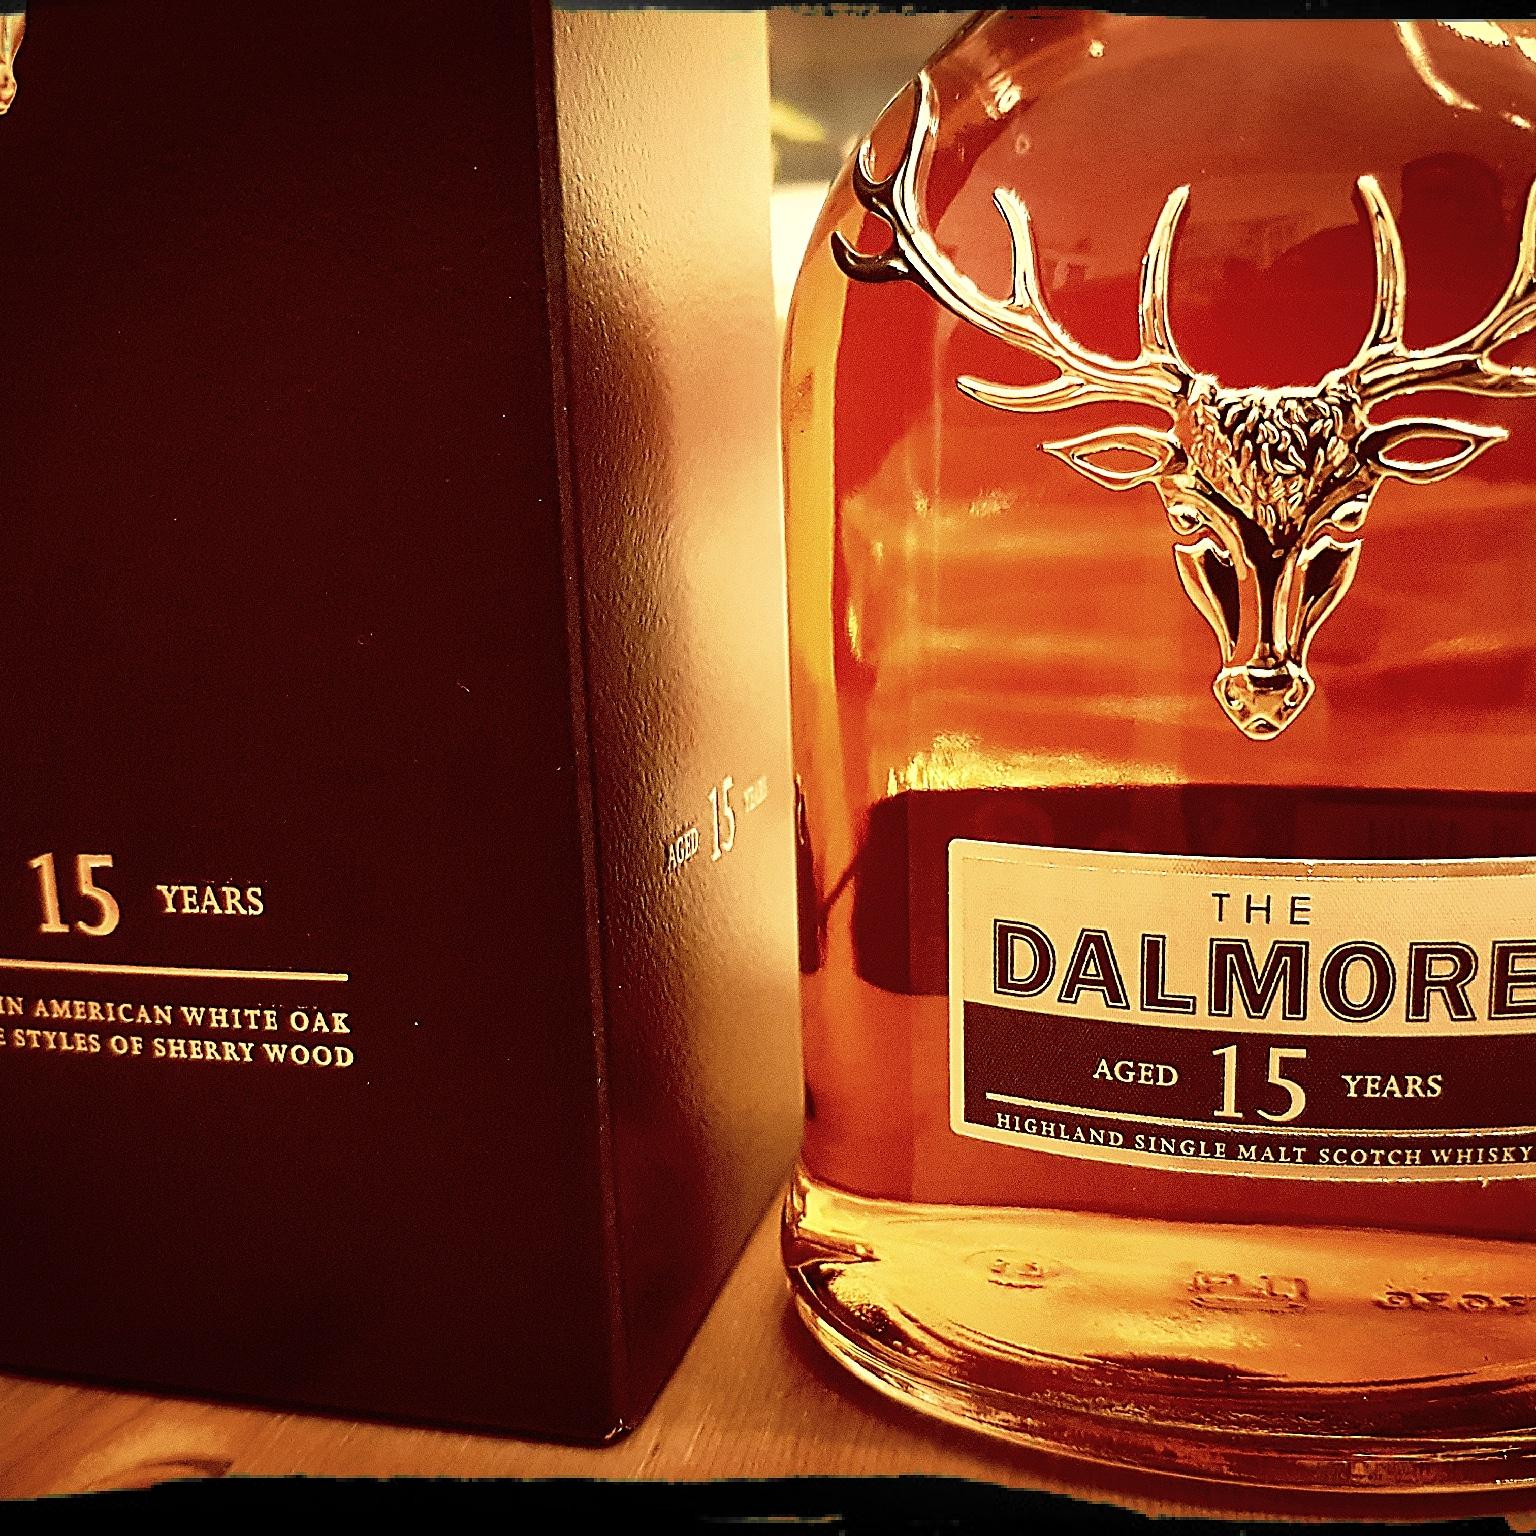 The Dalmore 15 Jahre Highland Single Malt Scotch Whisky